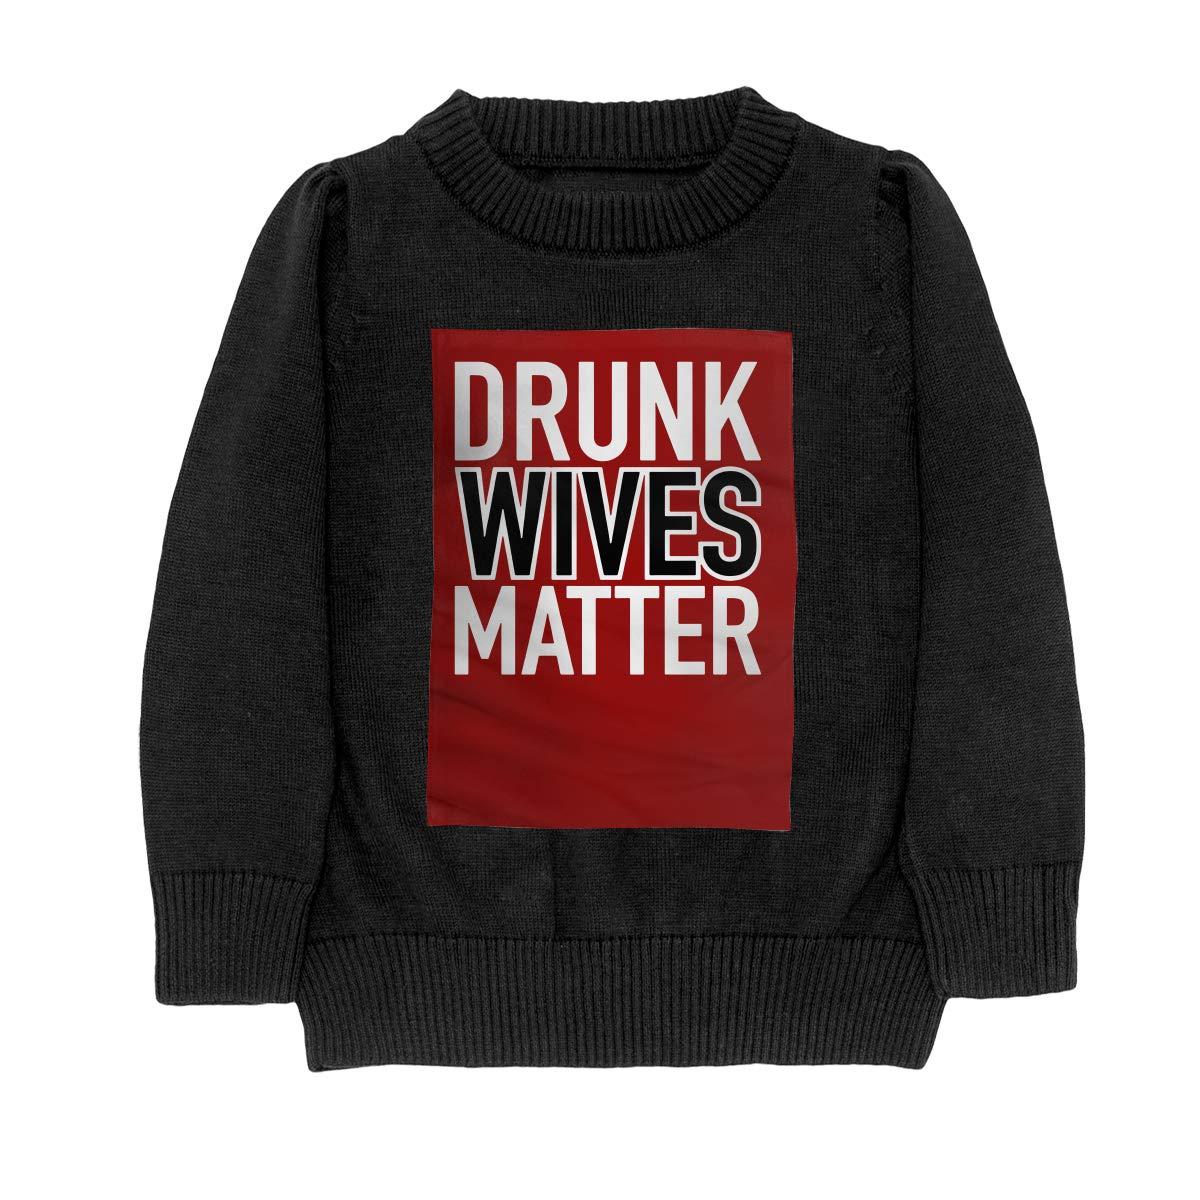 WWTBBJ-B Drunk Wives Matter Fashion Teenager Boys Girls Unisex Sweater Keep Warm